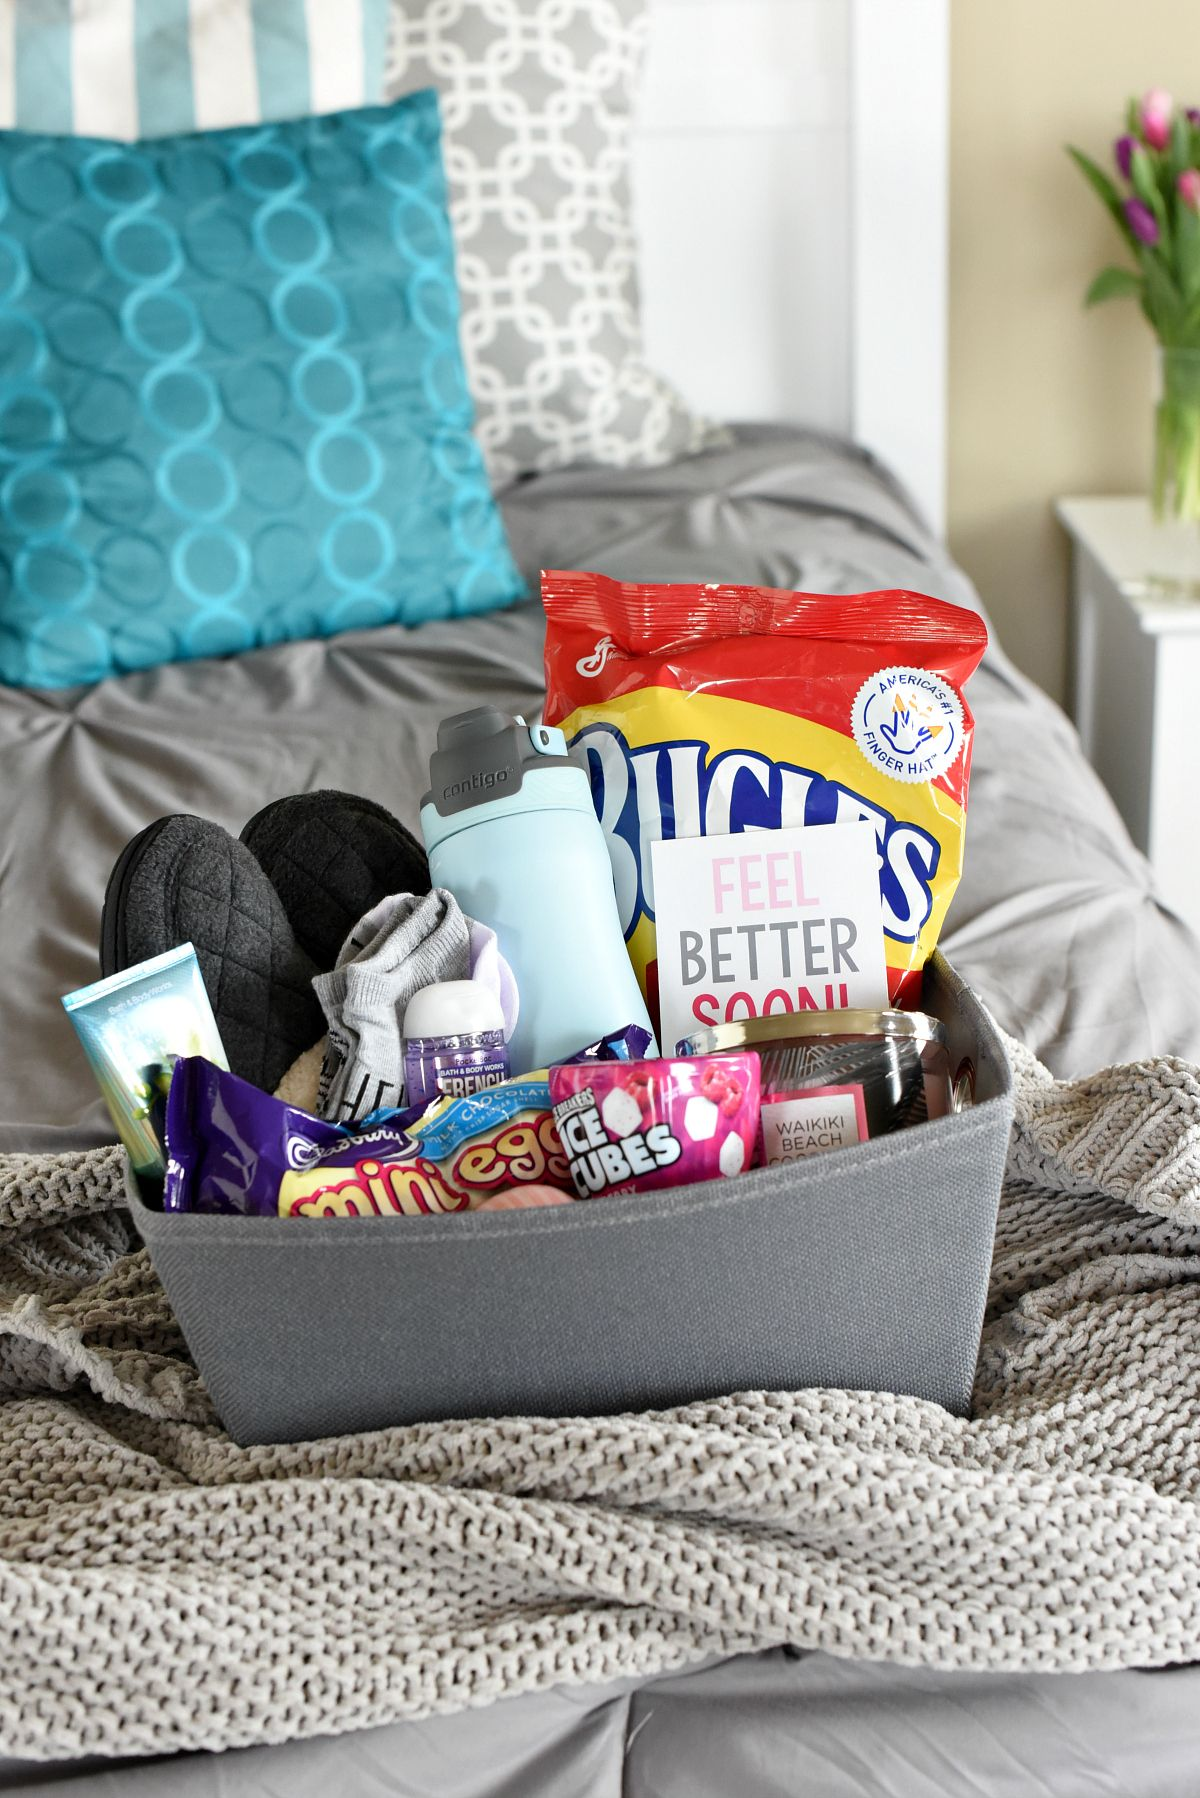 Get Well Soon Gift Ideas Gift Baskets Get Well Soon